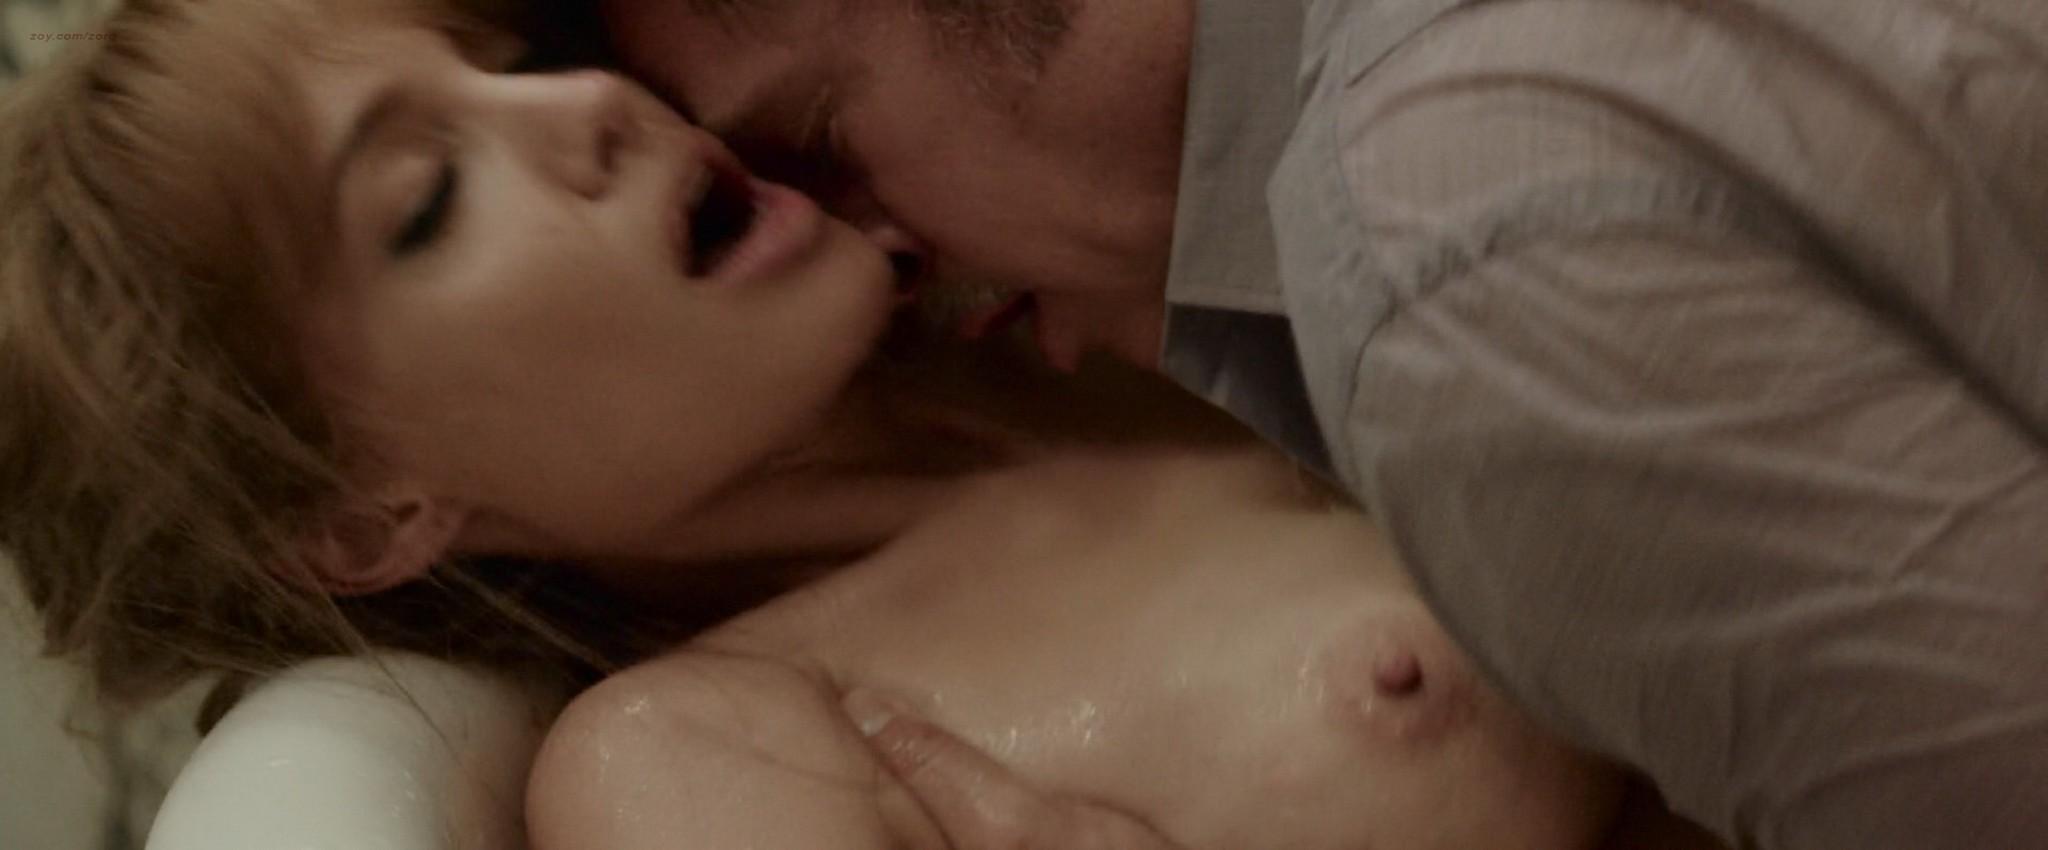 Angelina Jolienaked angelina jolie topless in the bath having sex - pichunter